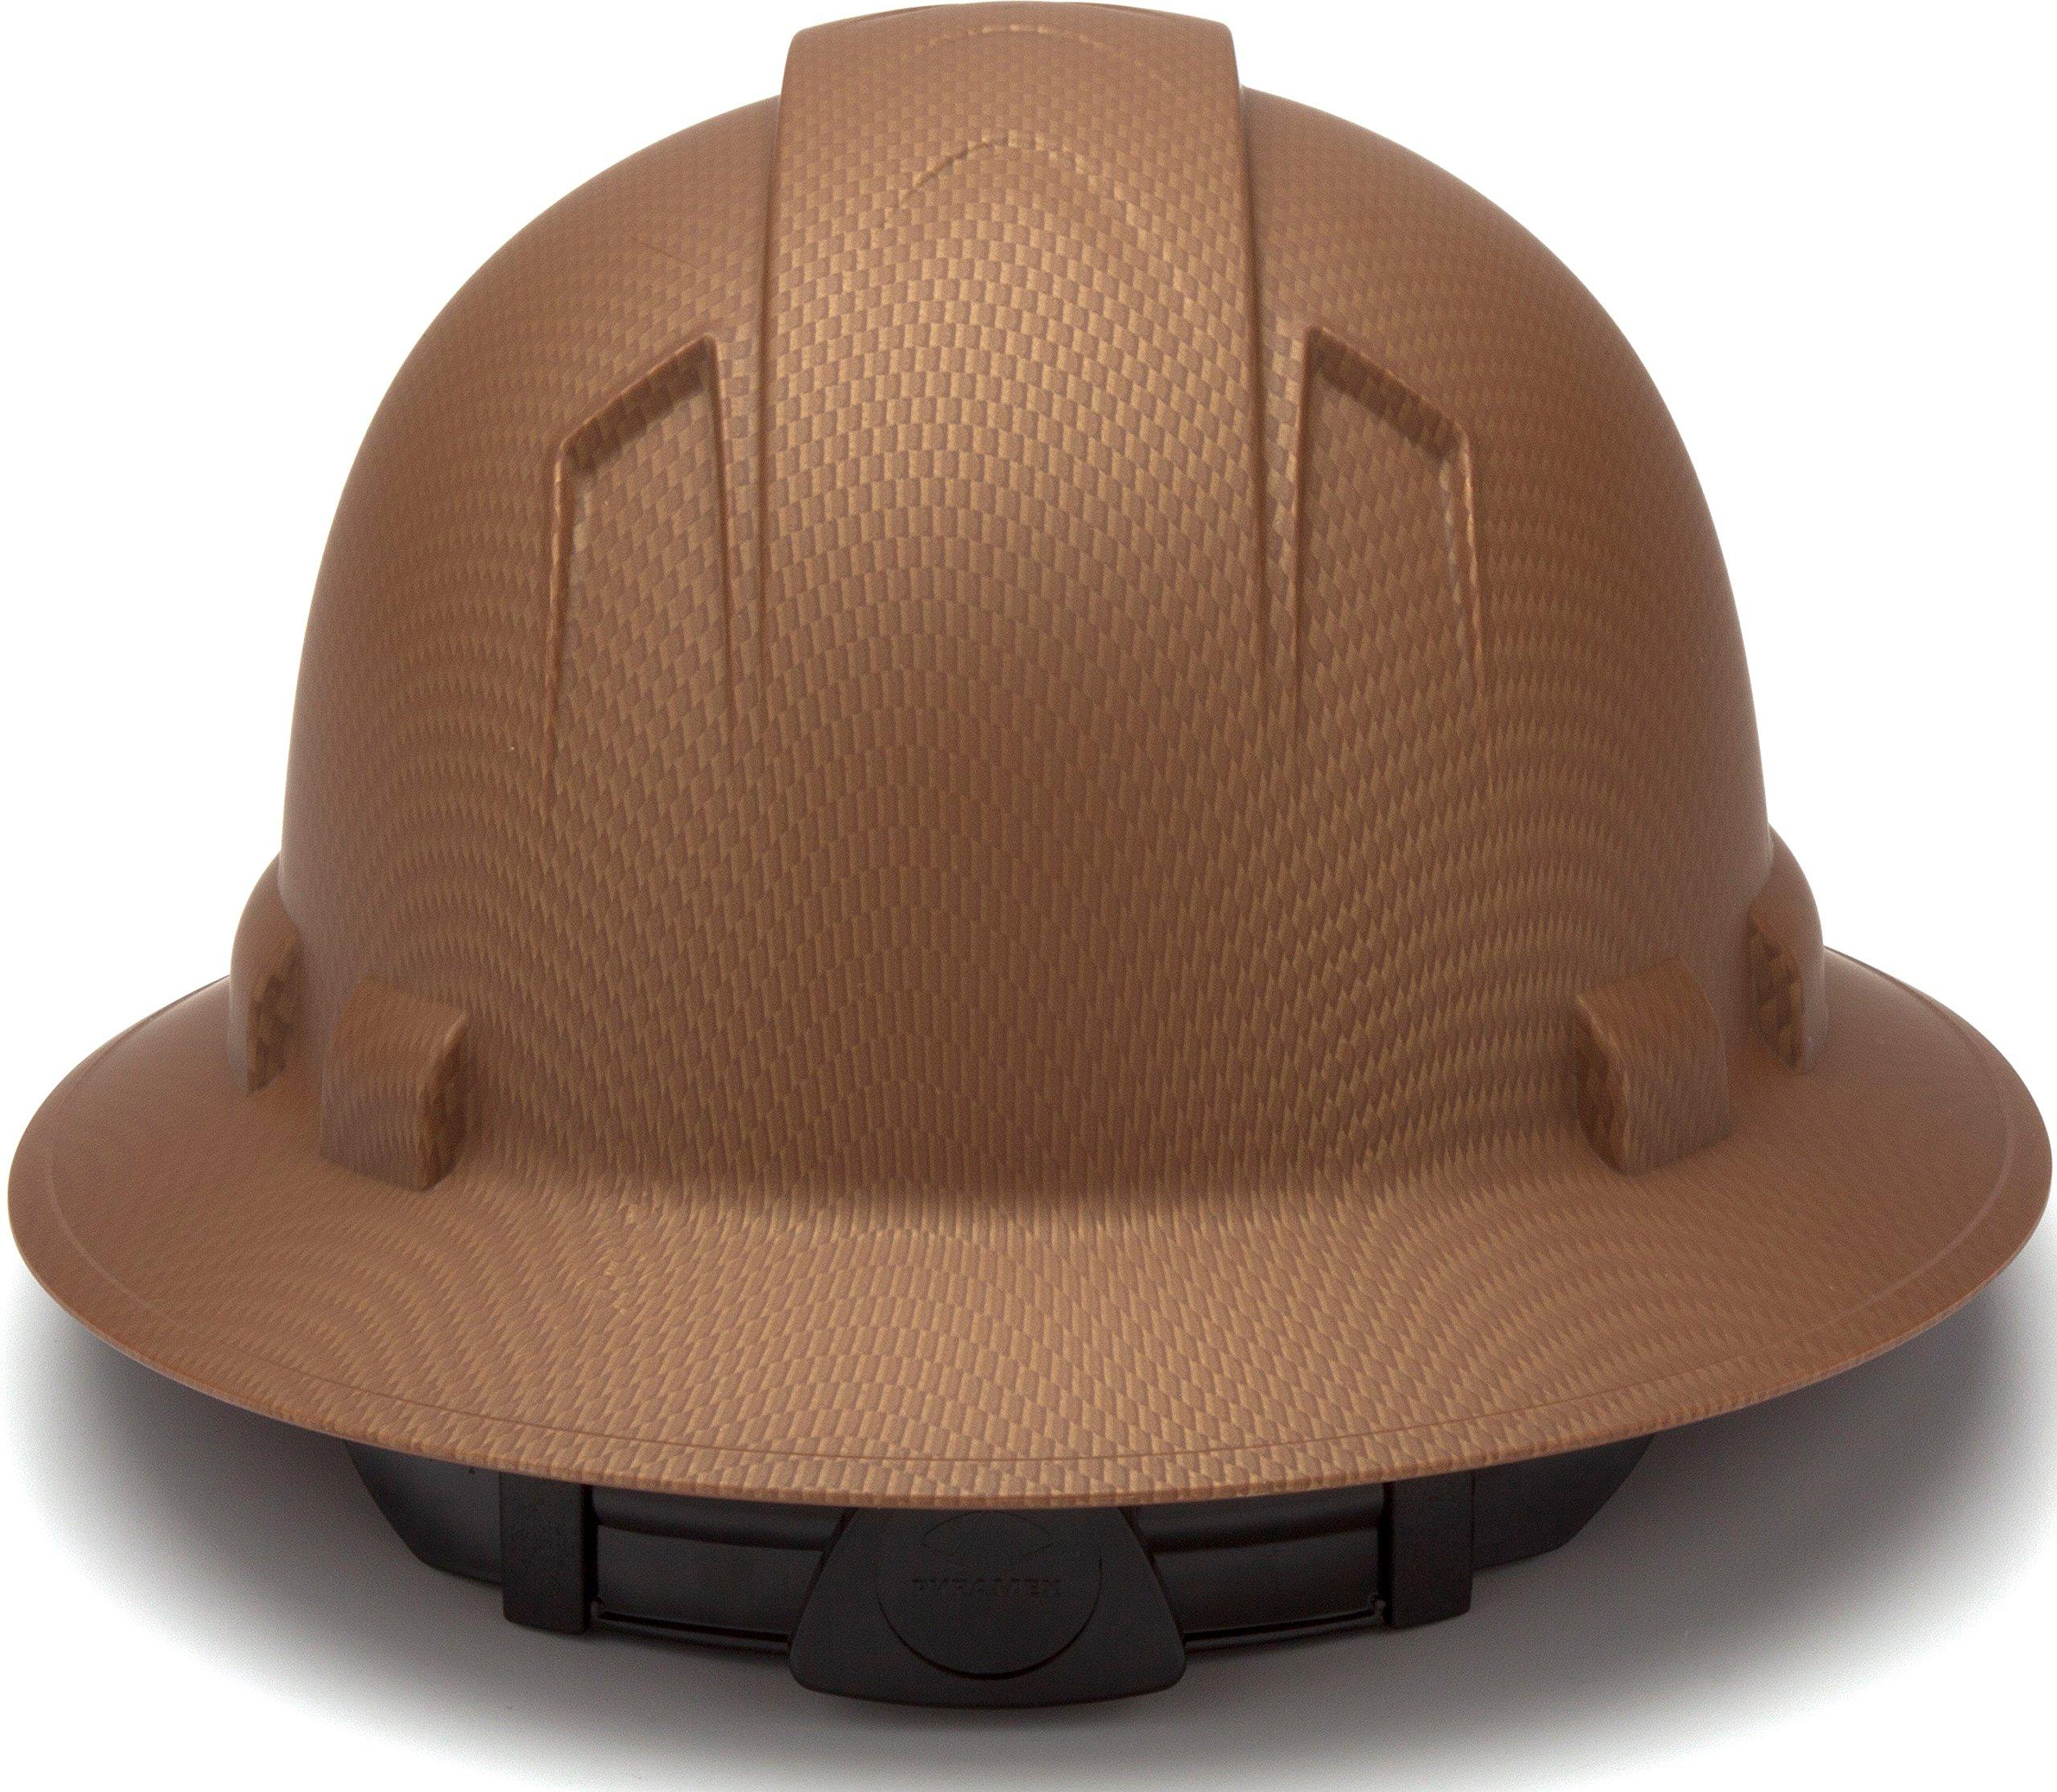 Pyramex Safety PYRAMEX - HP54118 - Copper - Full Brim Ridgeline Full Brim Graphite Pattern Hard Hat, Copper Graphite Pattern by Pyramex Safety (Image #4)